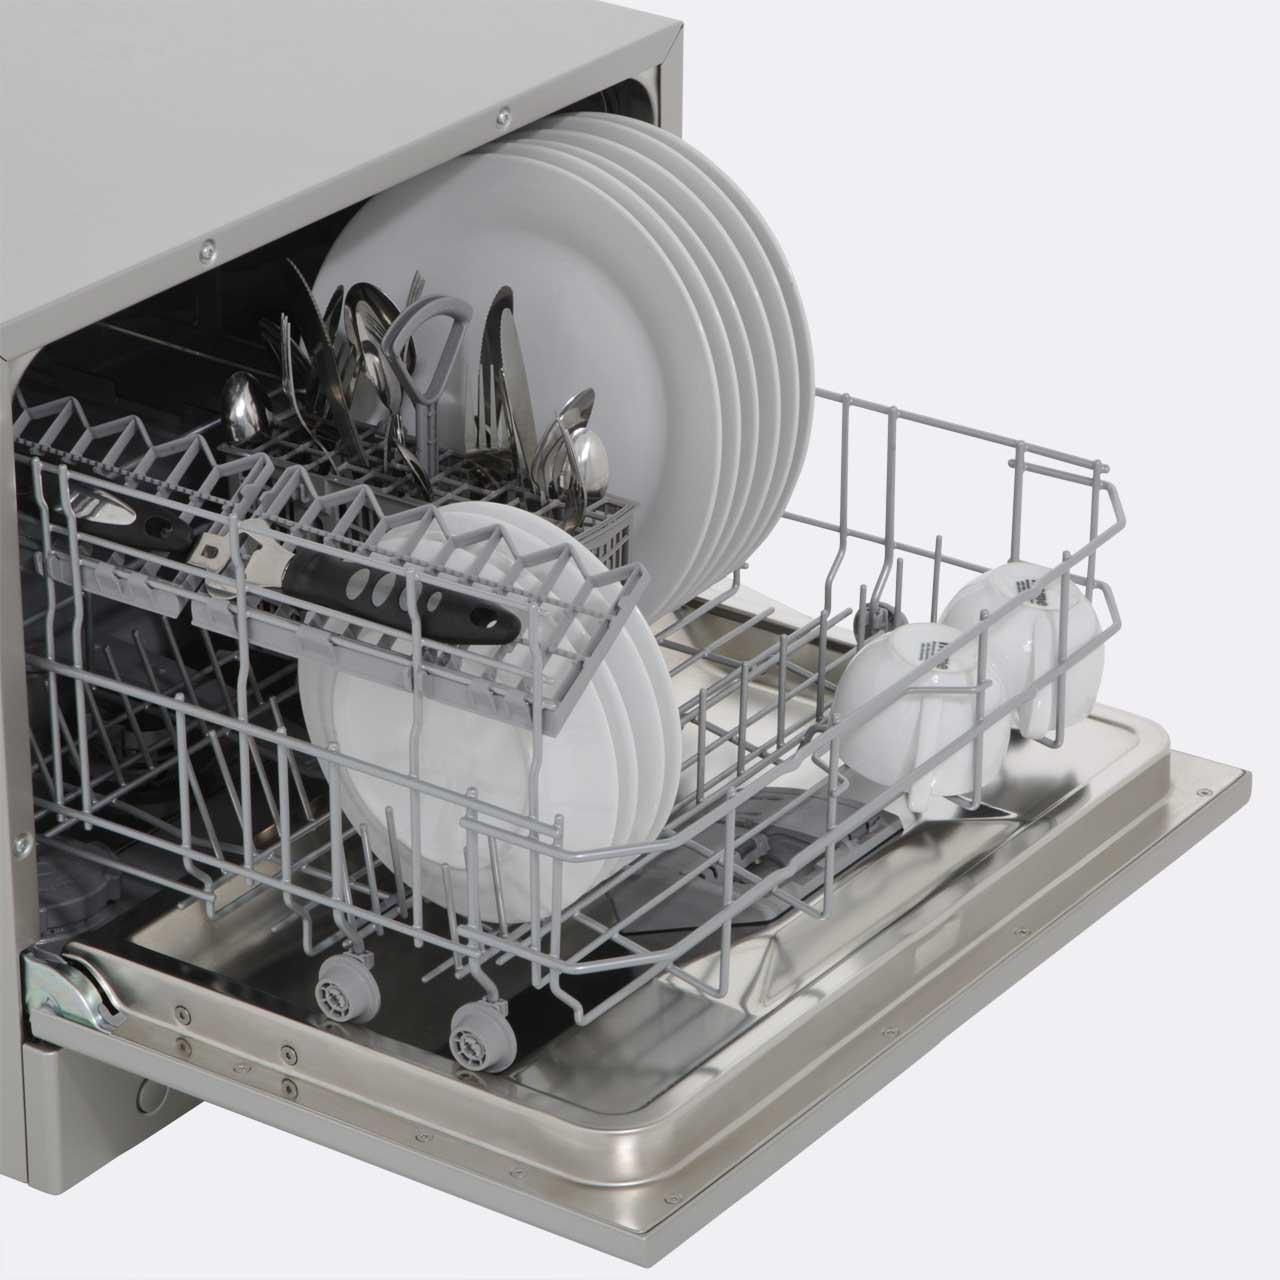 Table Top Dishwasher Reviews : Boots Kitchen Appliances Washing Machines, Fridges & More